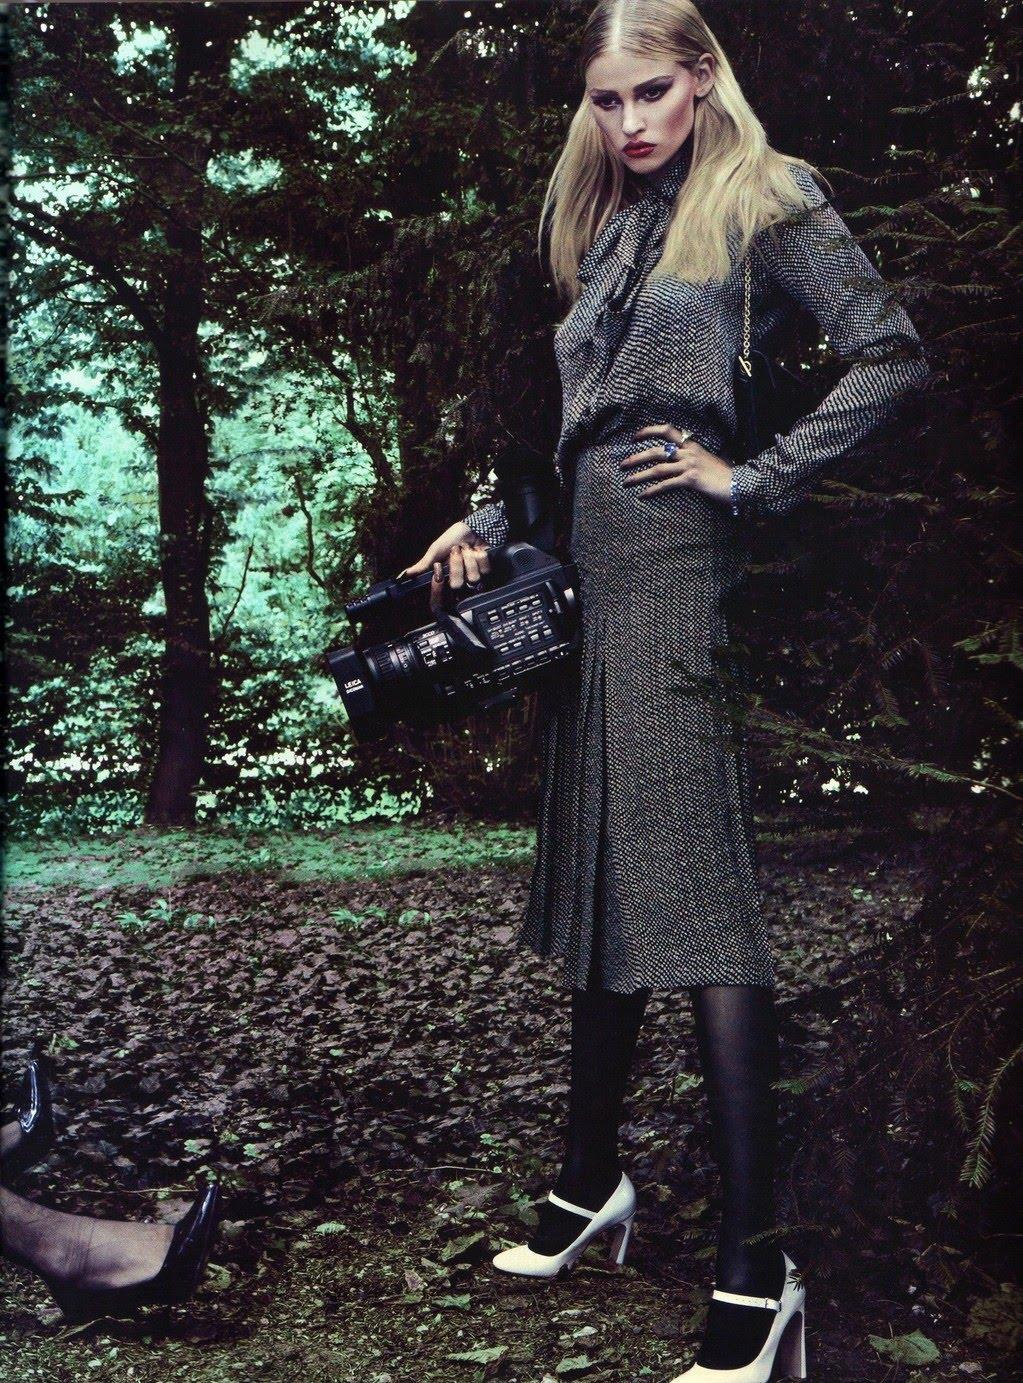 Lara Spencer 'furious' with Good Morning America Lara stone fashion spot